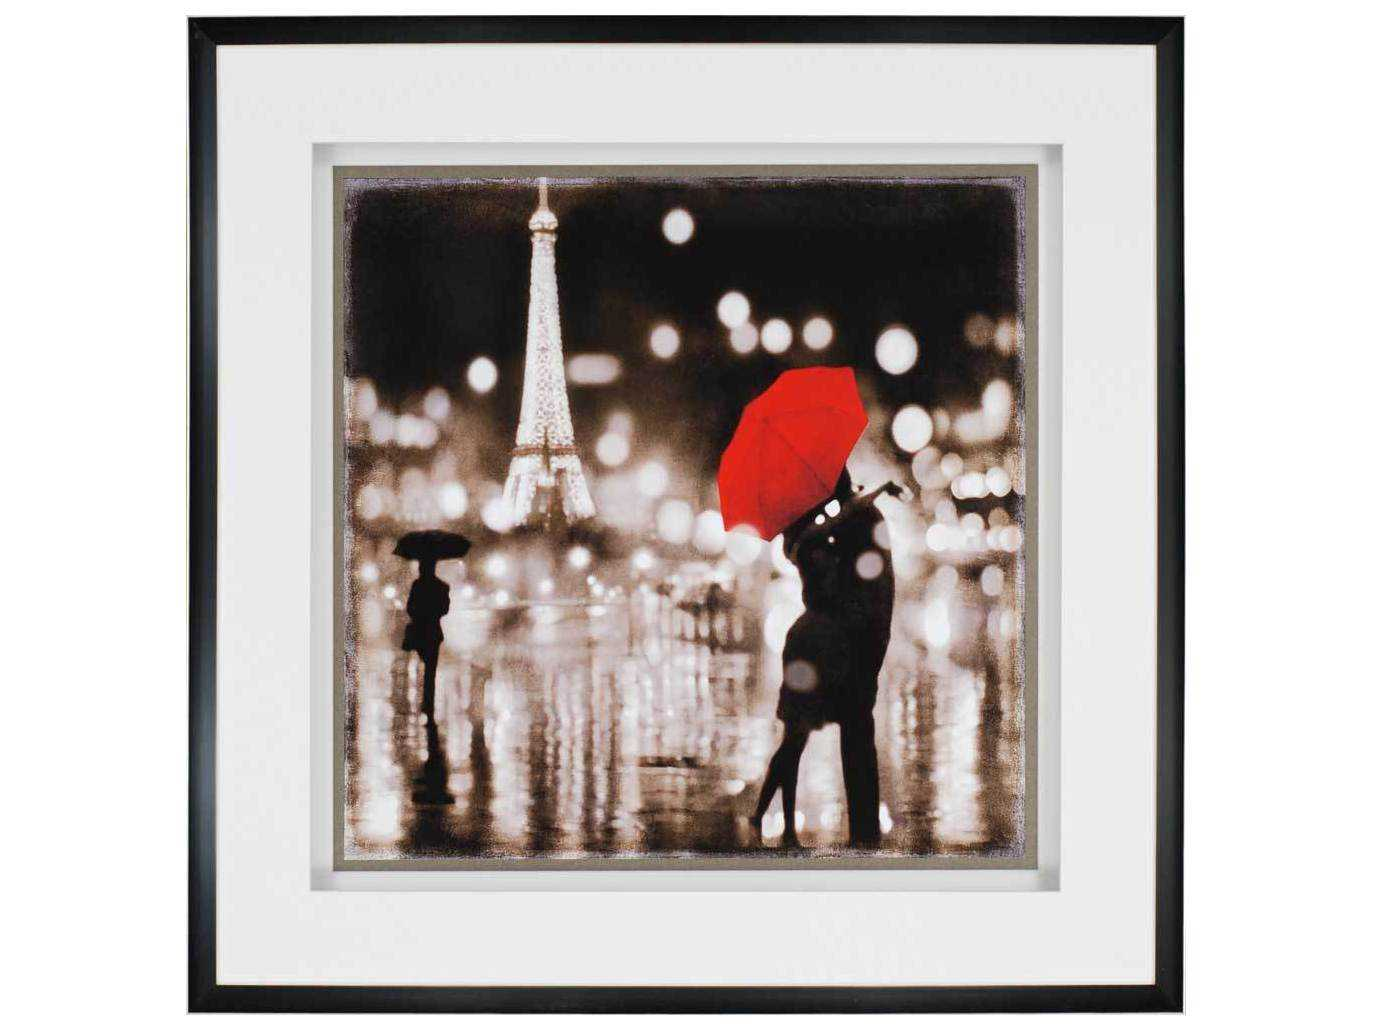 Beautiful Paris artwork for sale, Posters and Prints | Art.com